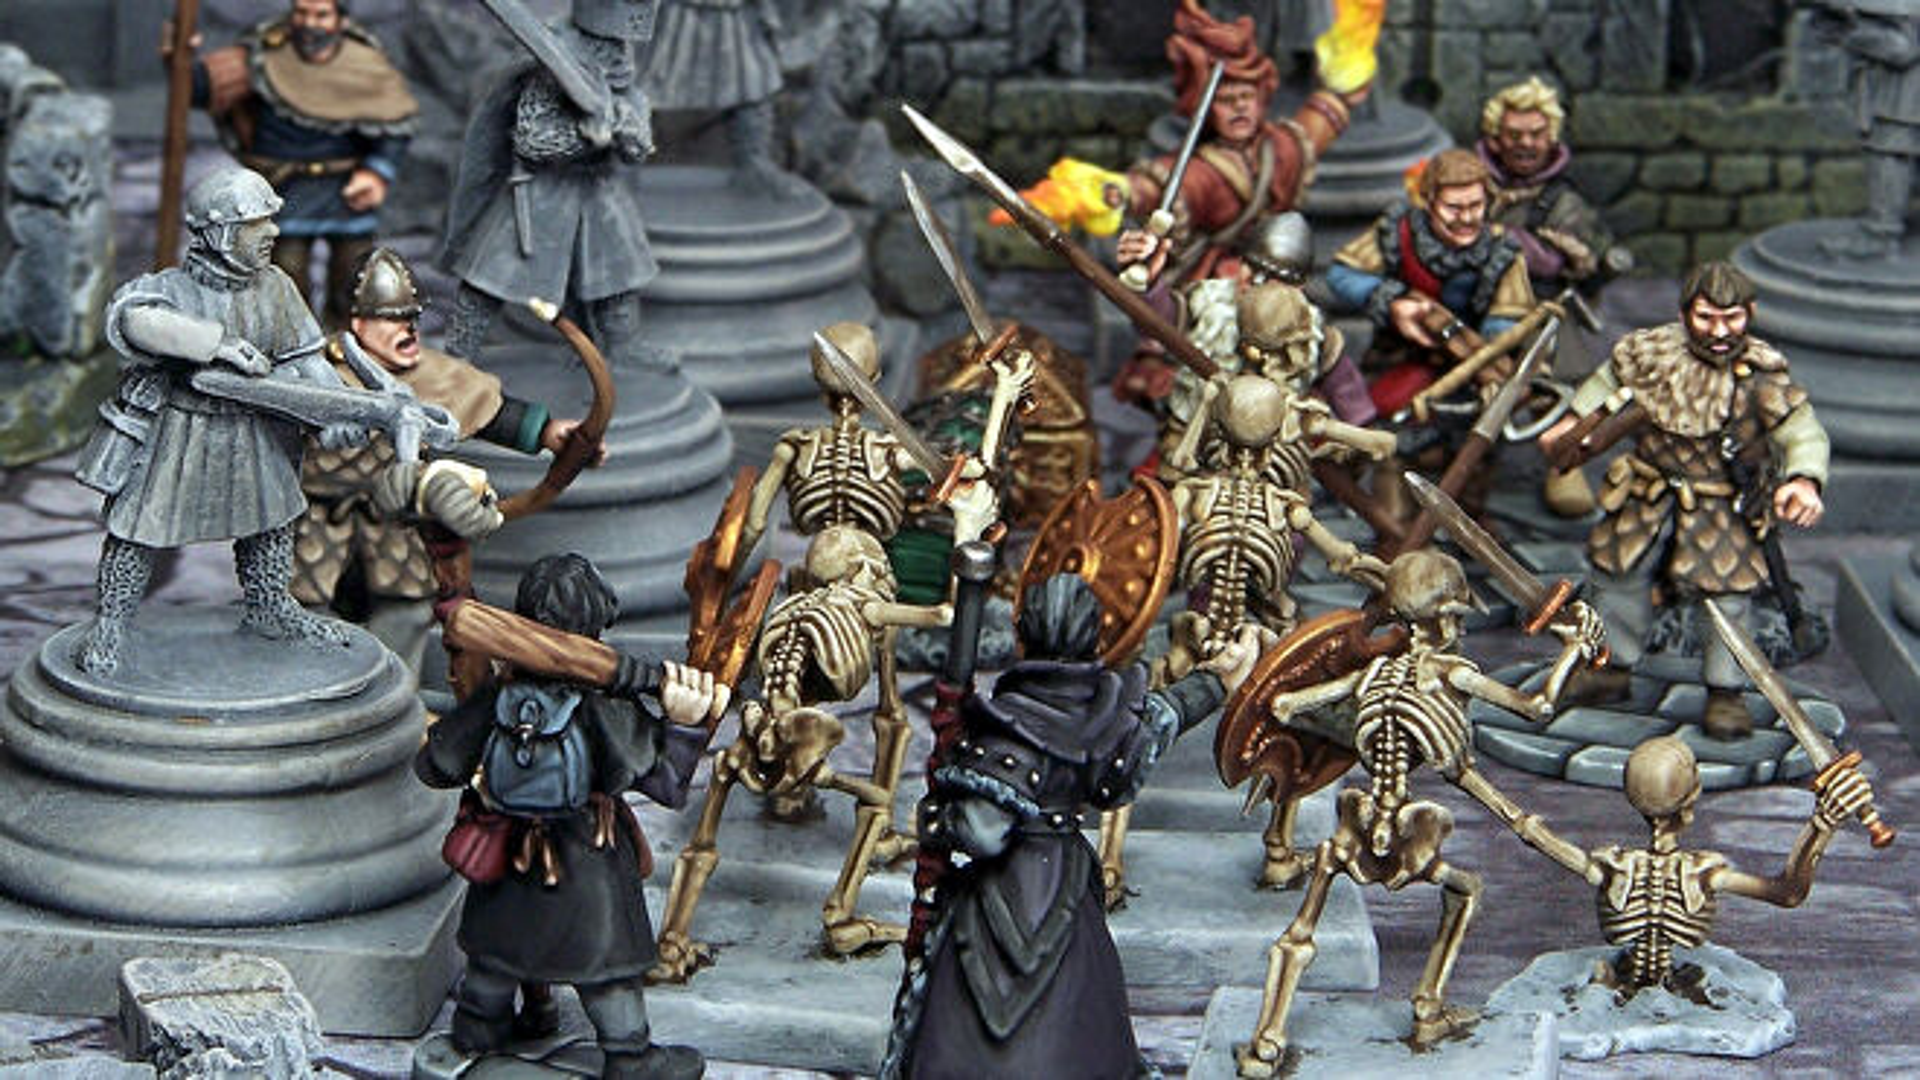 frostgrave-miniatures-game-skeletons.jpg